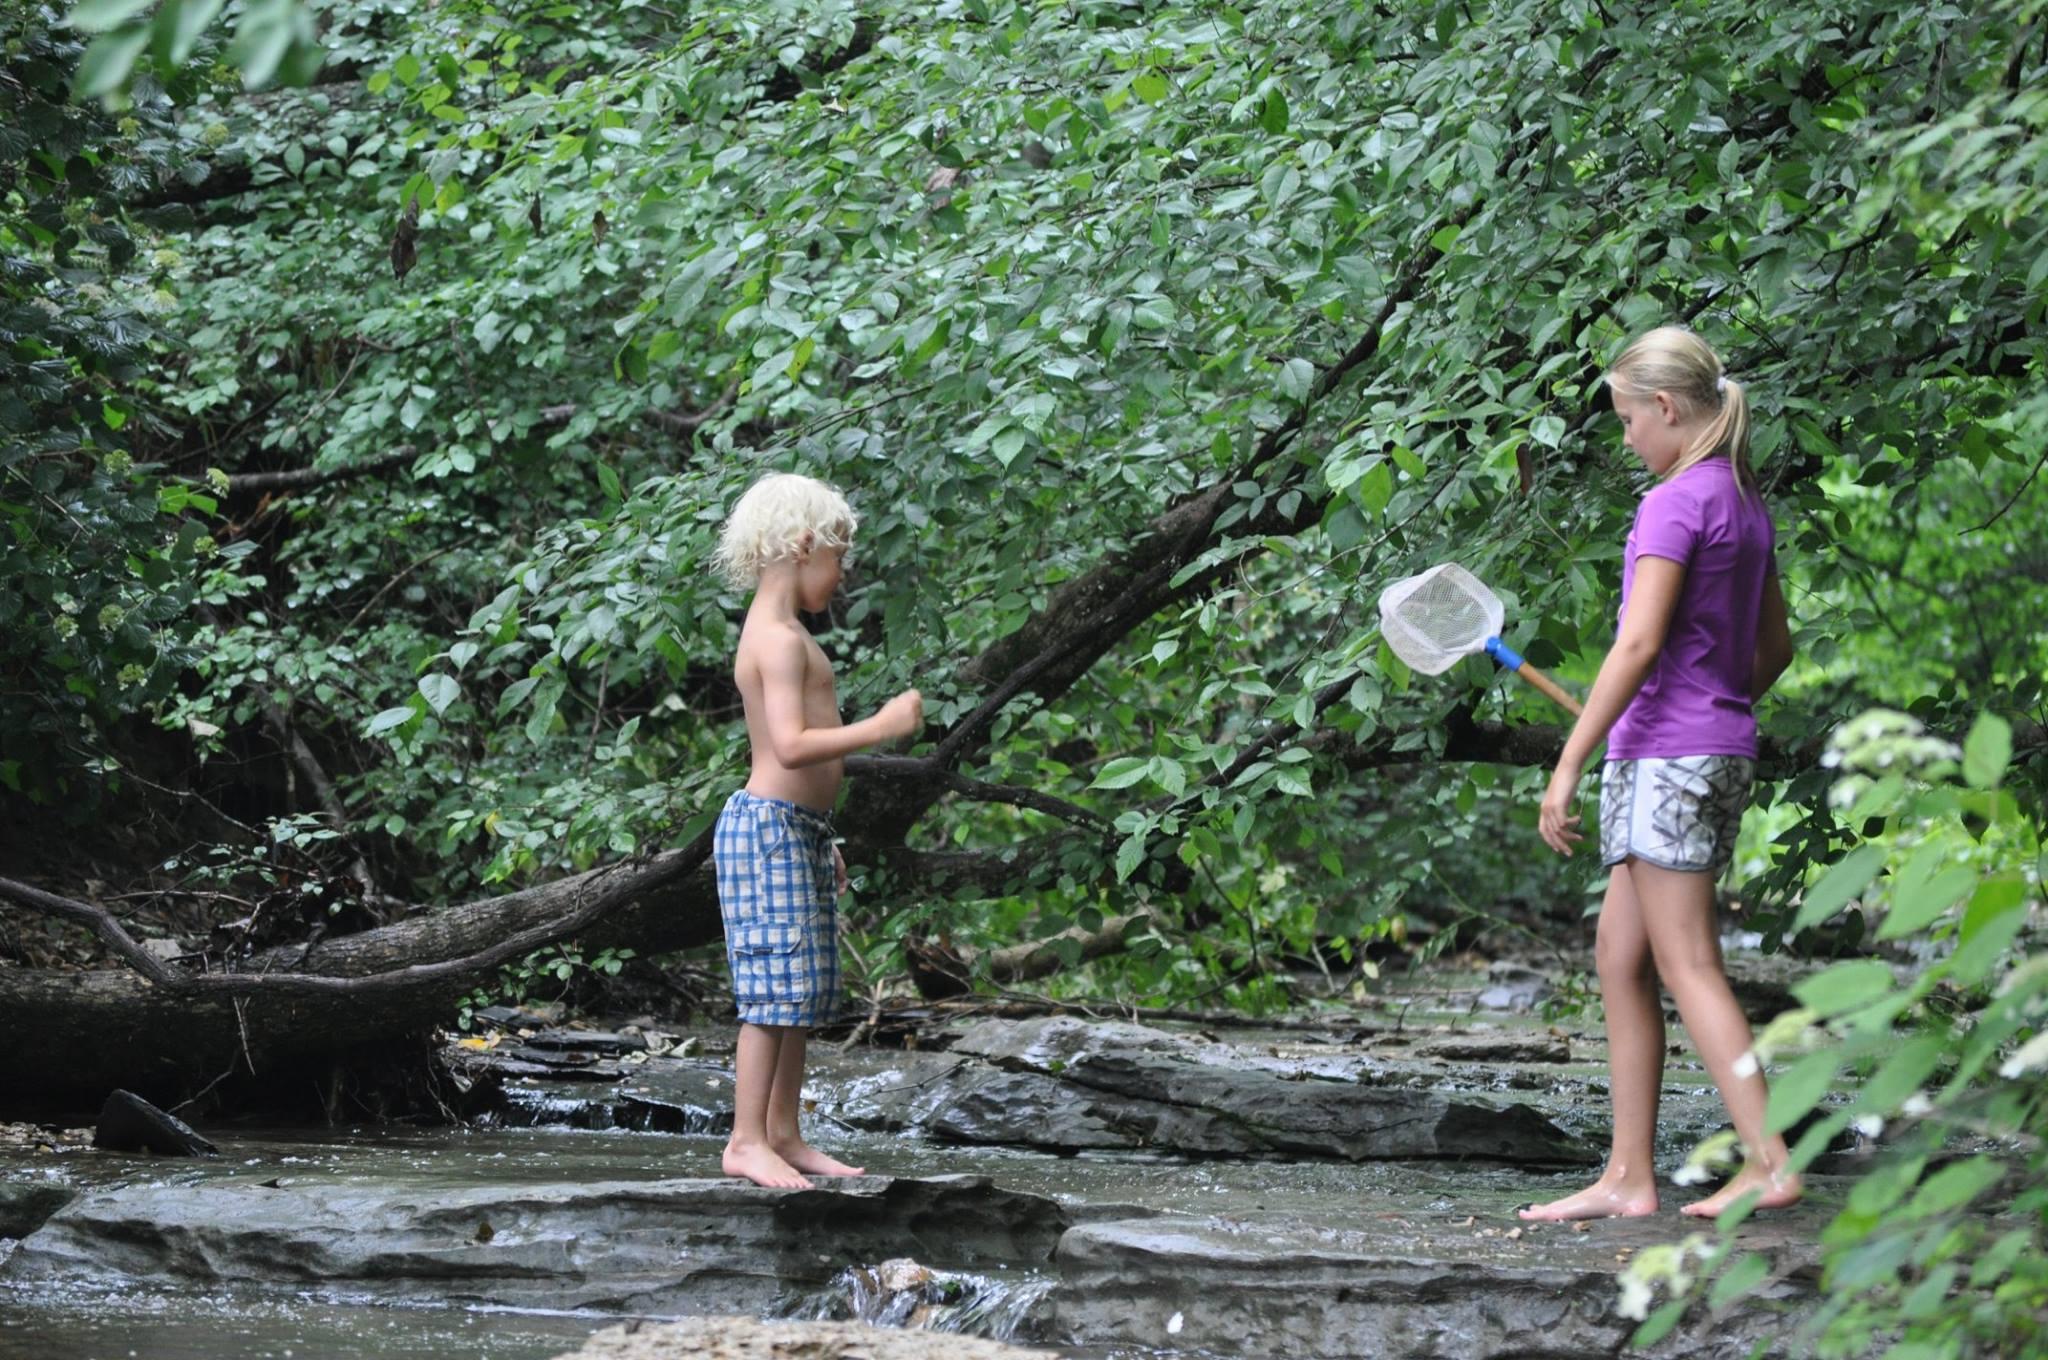 children, kids, play, forest, woods, creek, waterfall